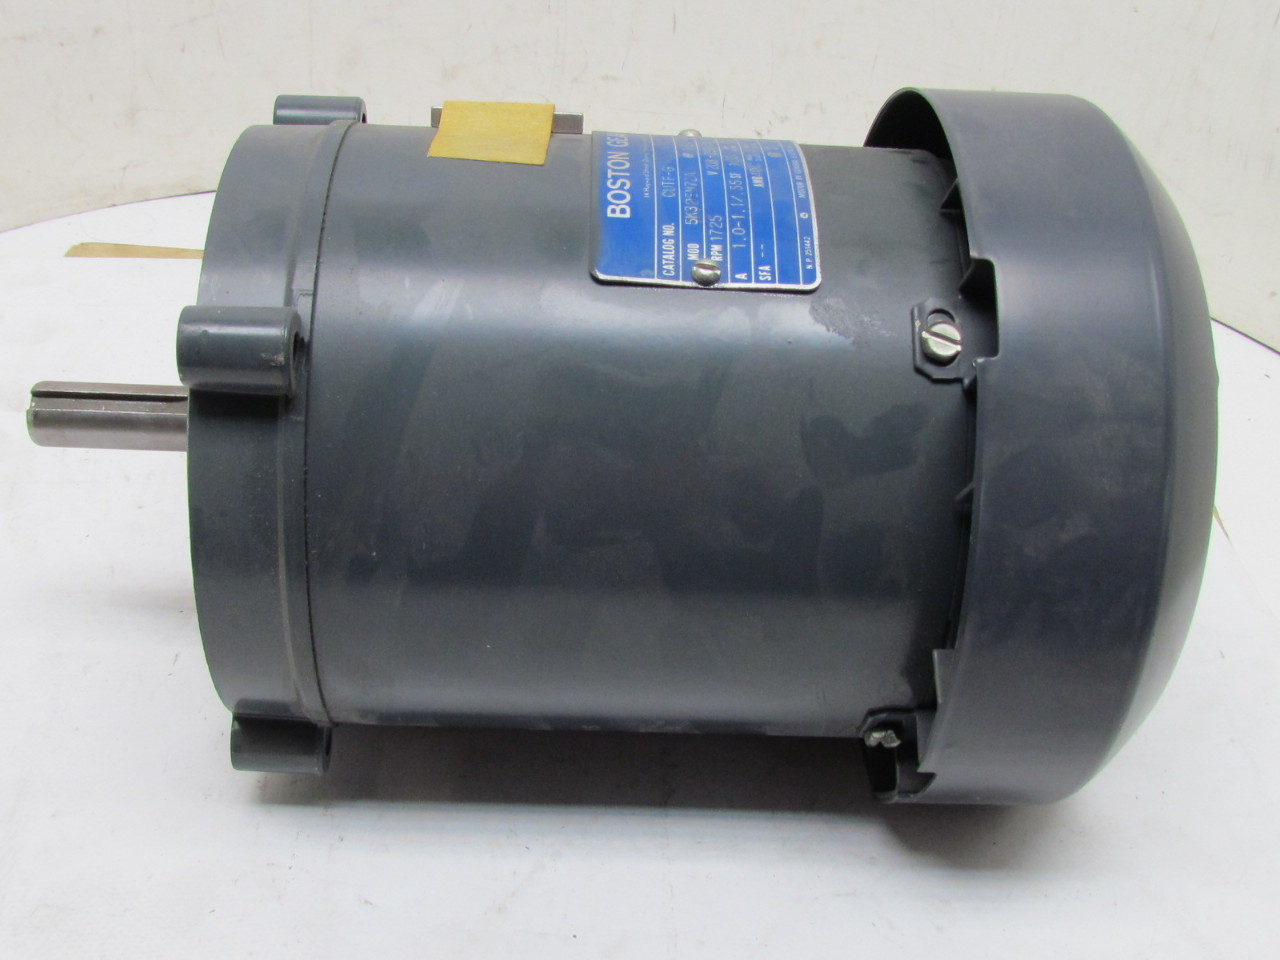 Boston gear 5k32en72a electric motor 1 6 hp 1725 rpm 3 ph for 1 hp electric motor 1725 rpm